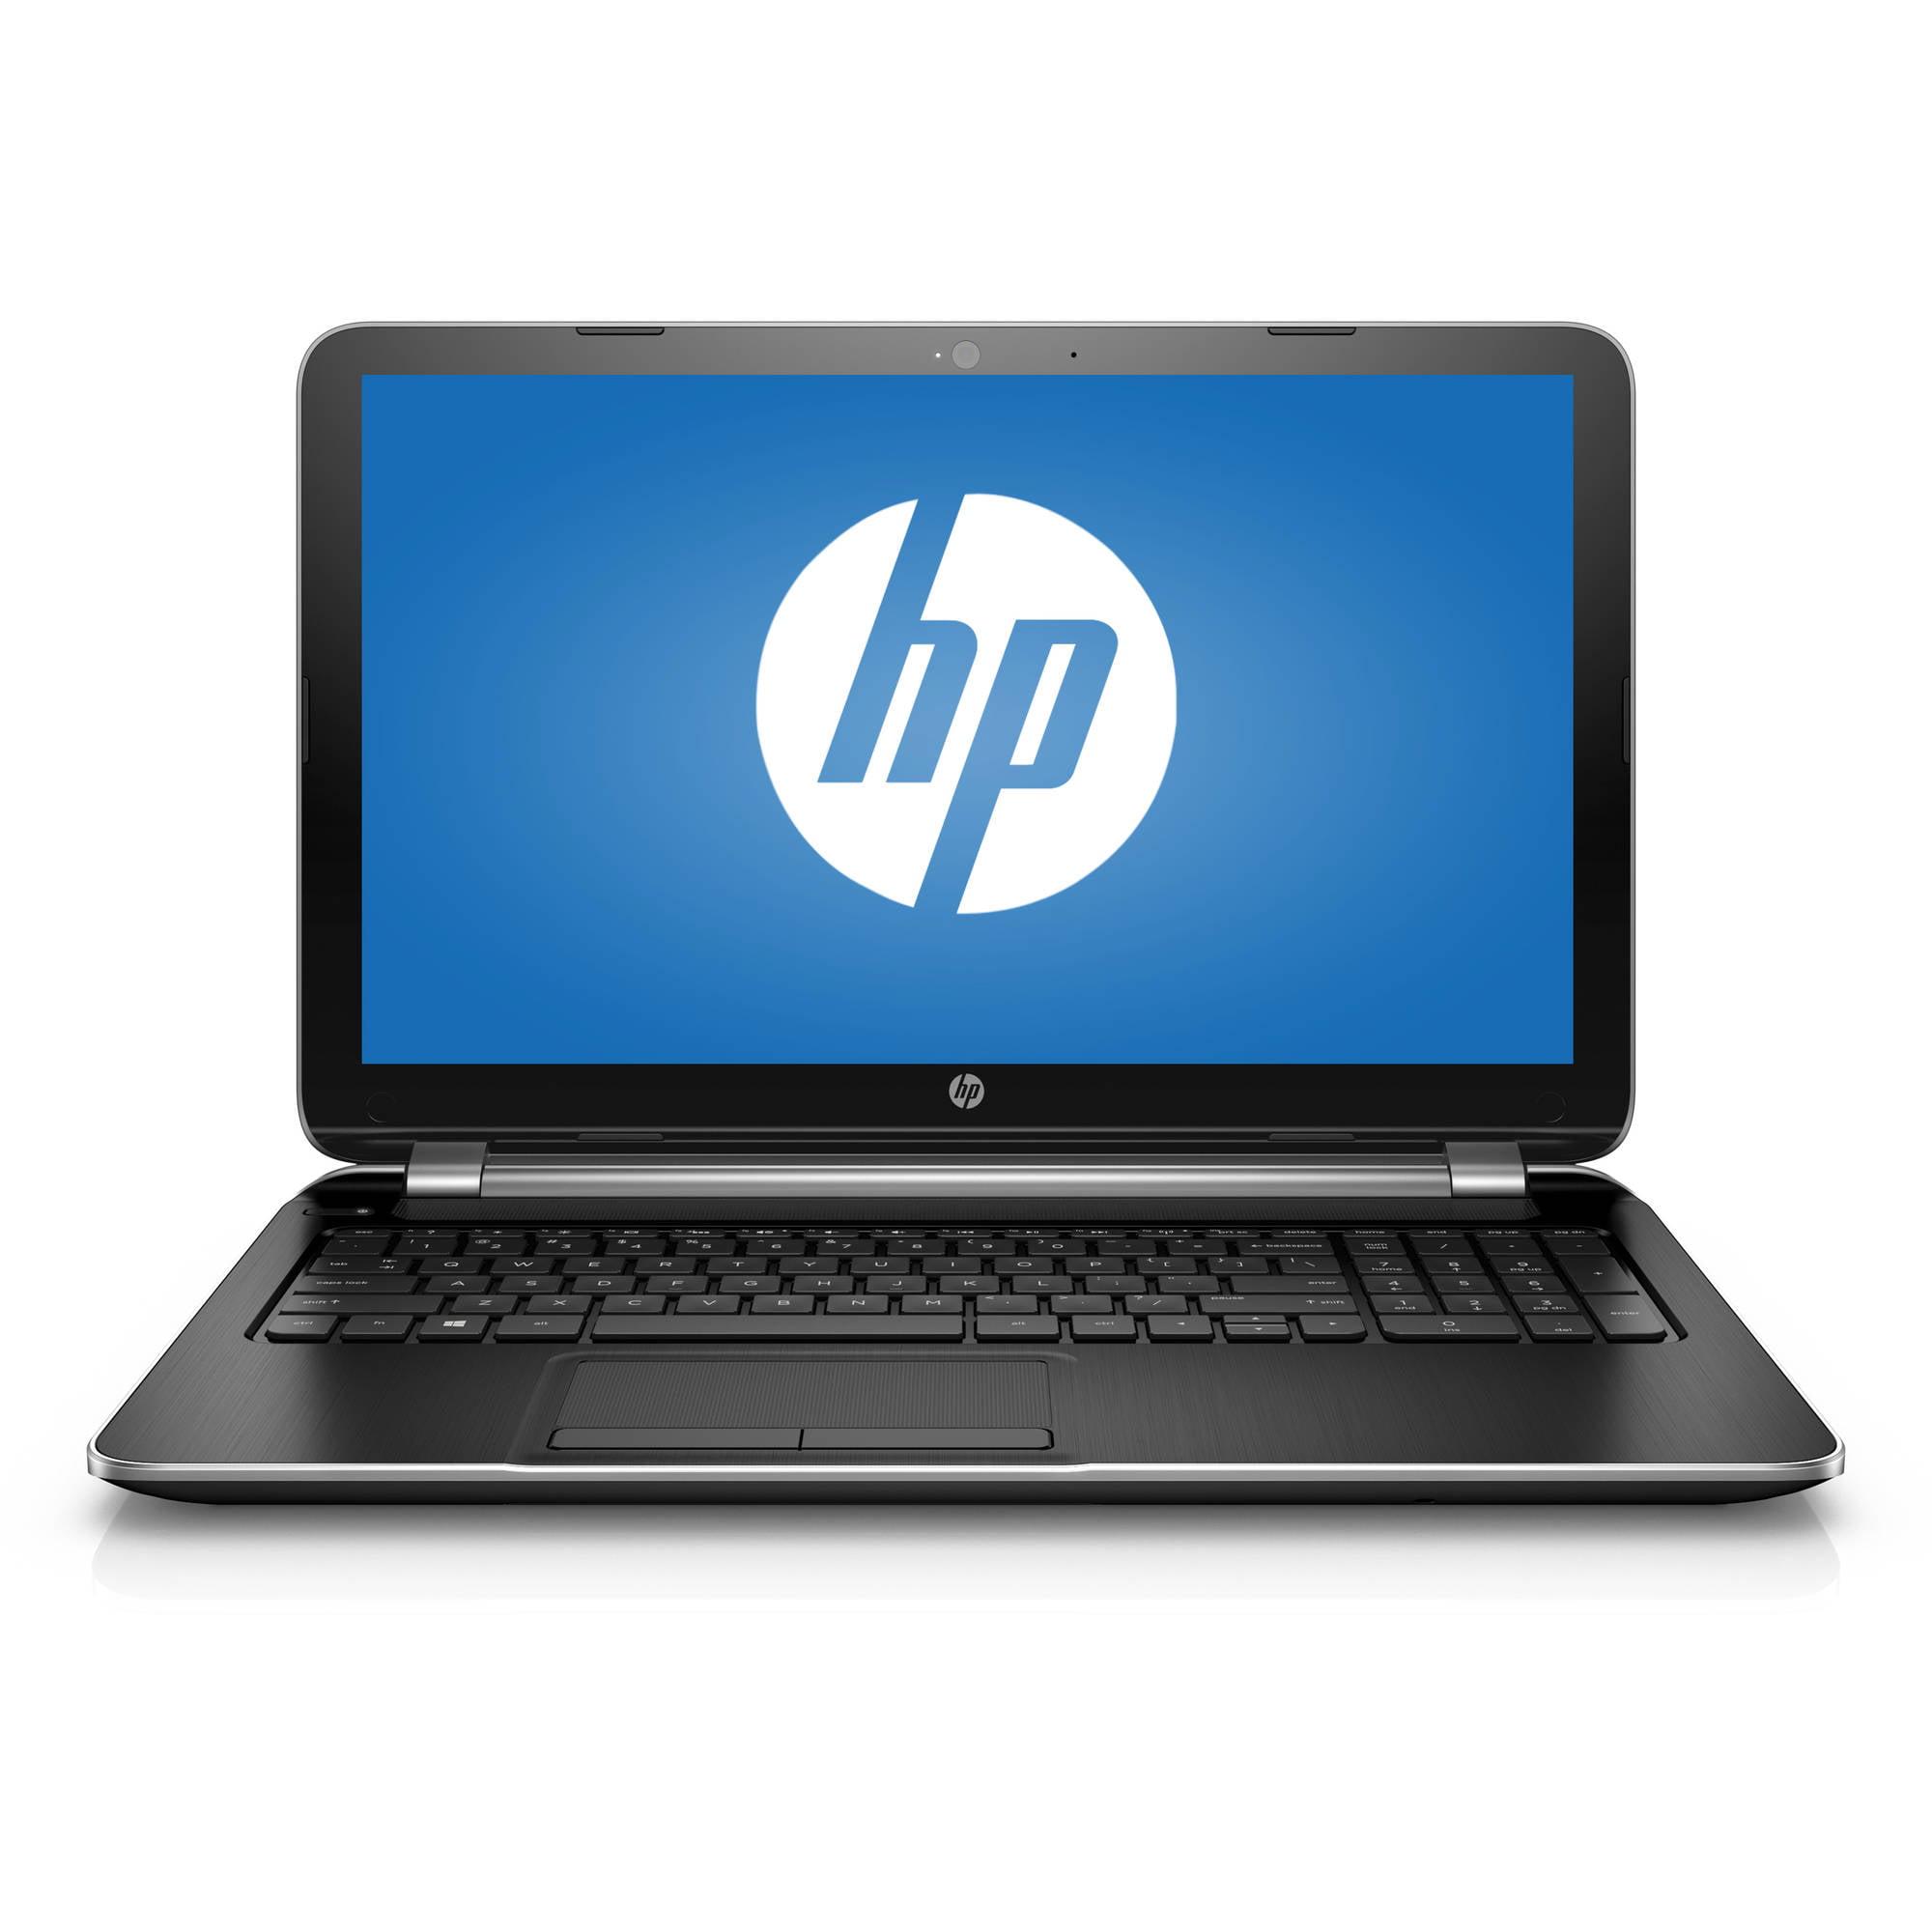 "Refurbished HP Silver 15.6"" 15-f271wm Laptop PC with Intel Pentium N3540 Quad-Core Processor, 4GB Memory, 500GB... by HP"